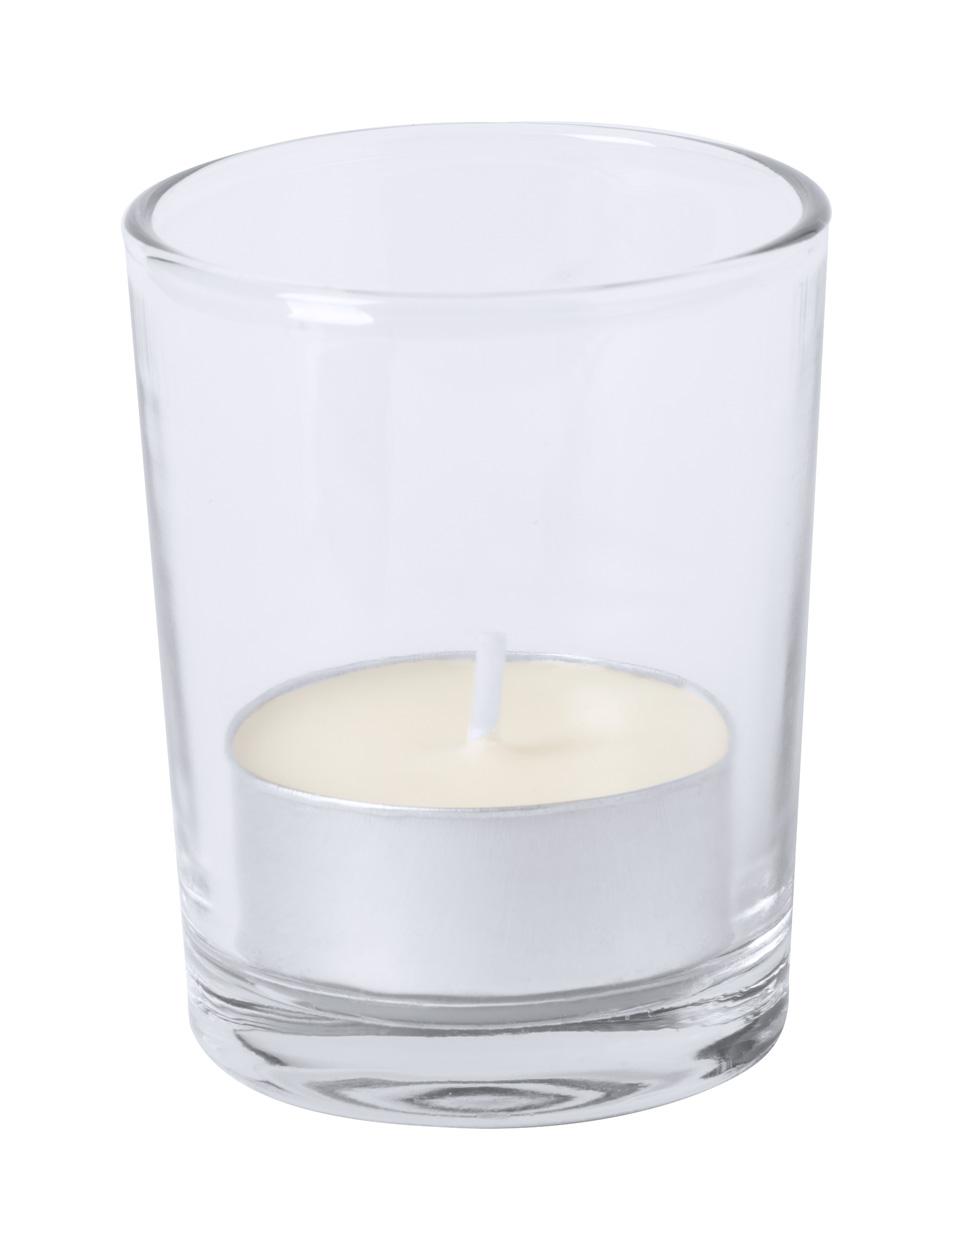 Persy svíčka, Vanilka